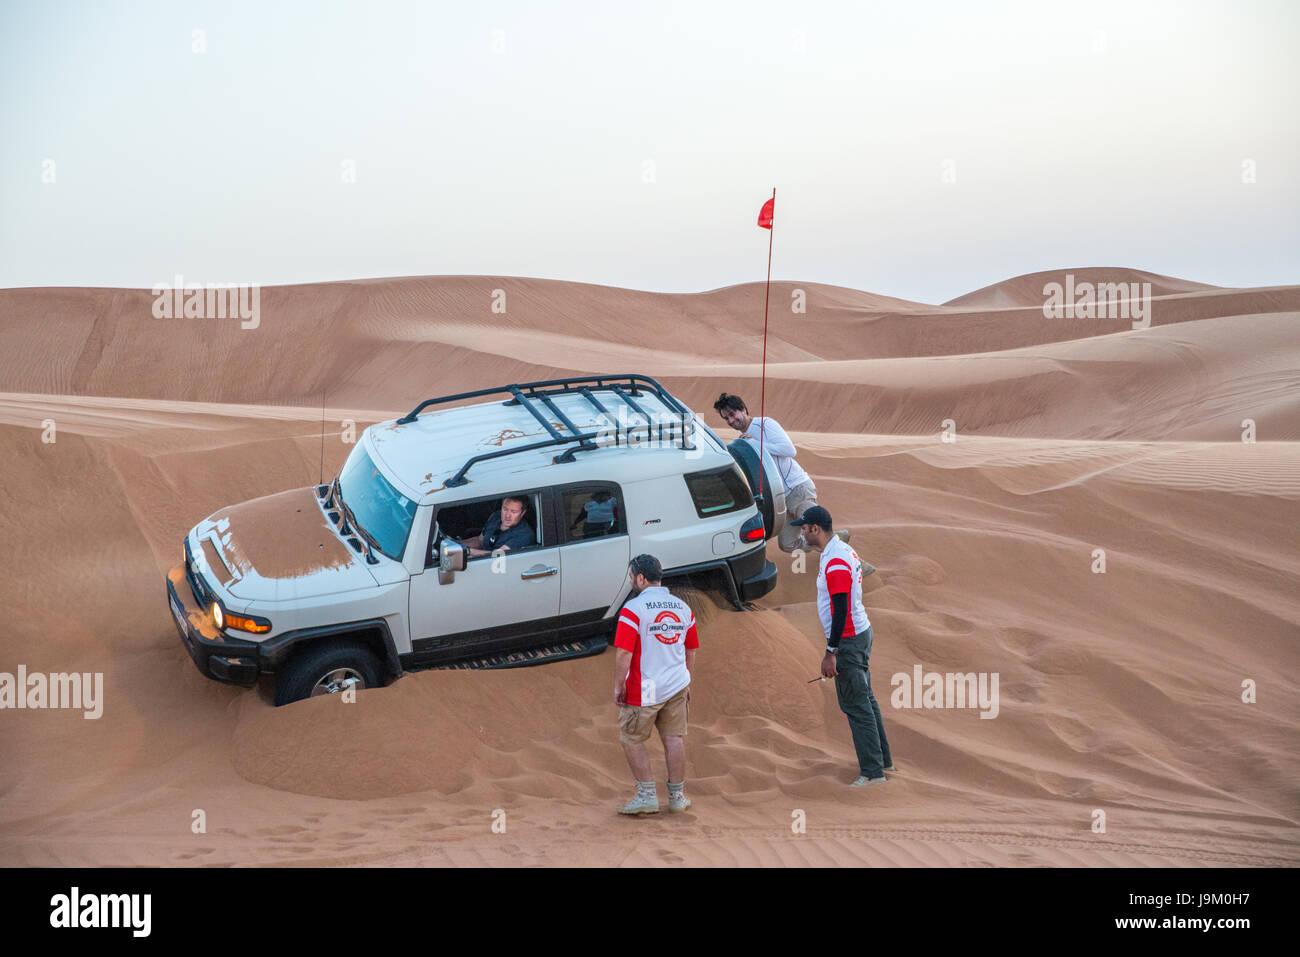 car-stuck-on-sand-whilst-off-roading-in-dubai-united-arab-emirates-J9M0H7.jpg